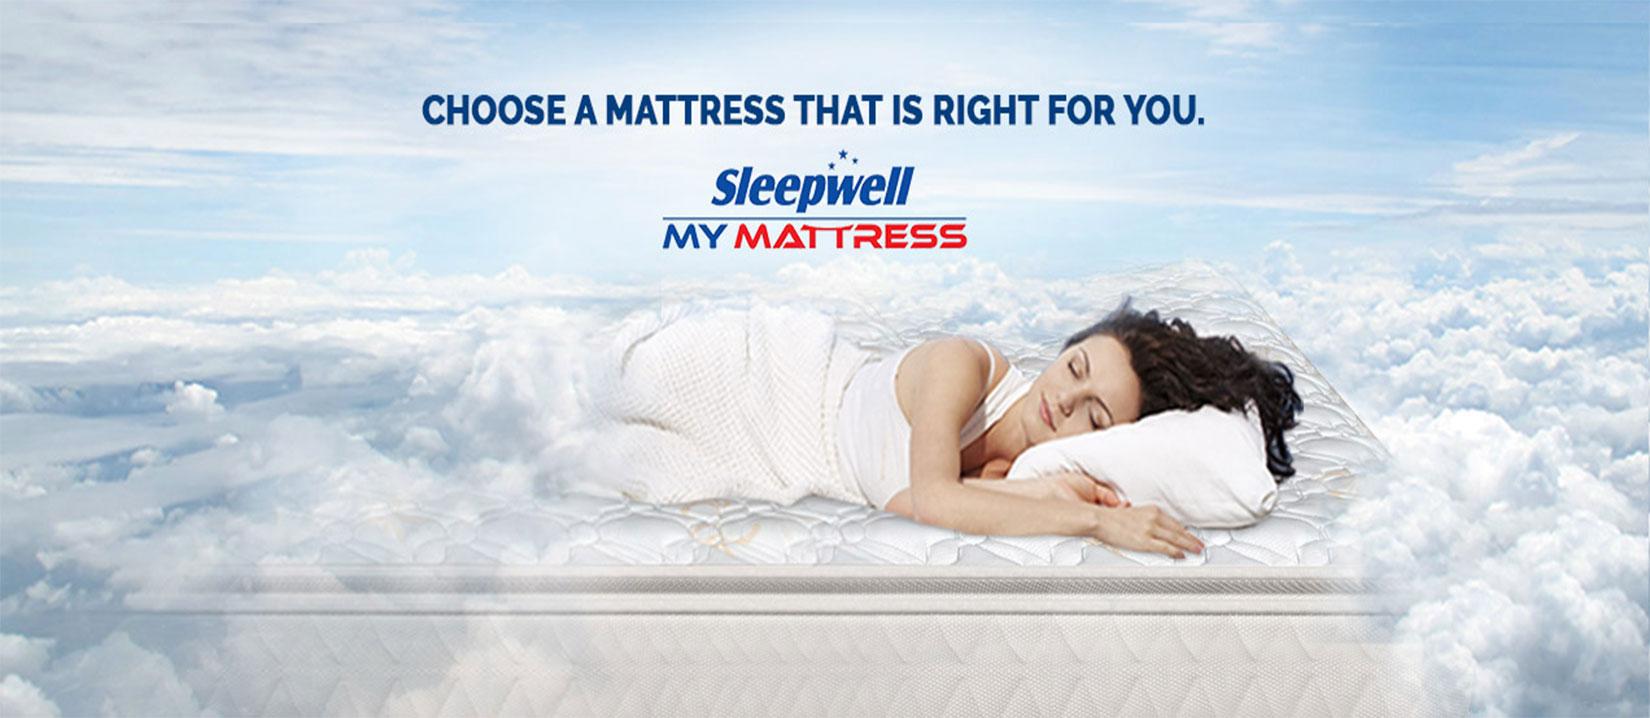 Sleepwell Mattress In Delhi Sleepwell Mattress Dealers In Delhi